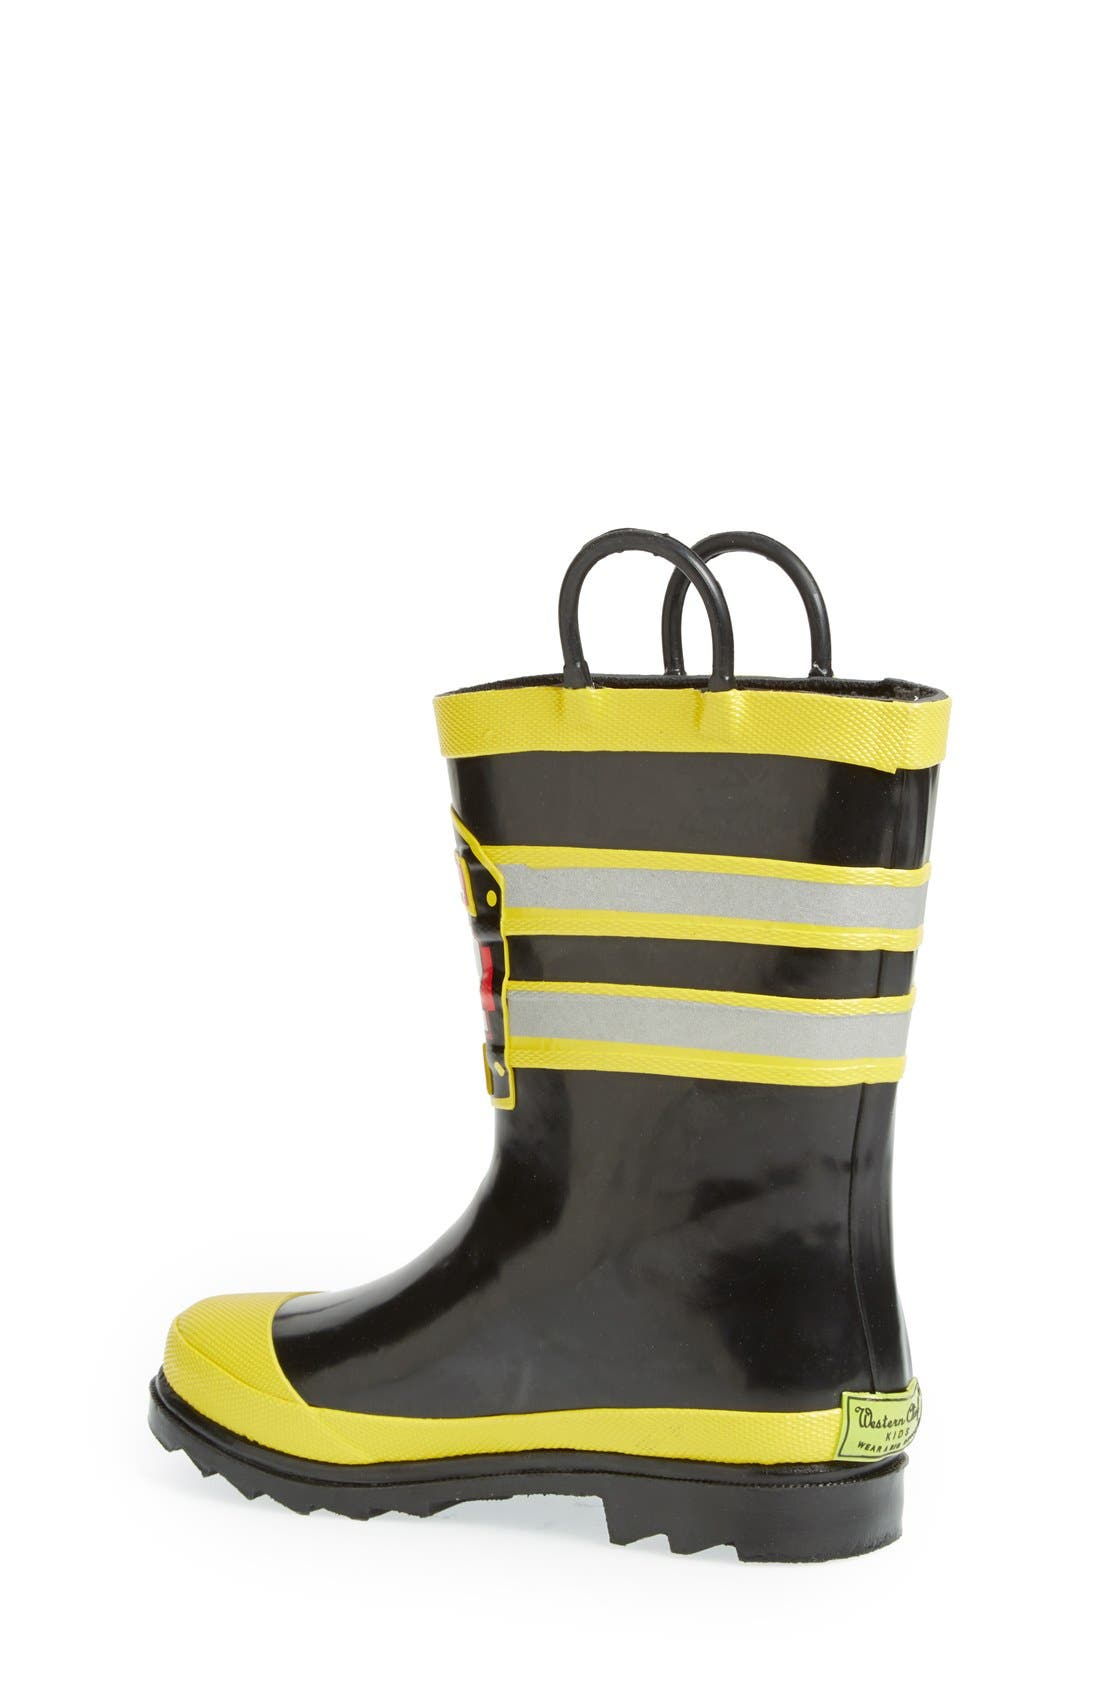 F.D.U.S.A. Rain Boot,                             Alternate thumbnail 2, color,                             BLACK